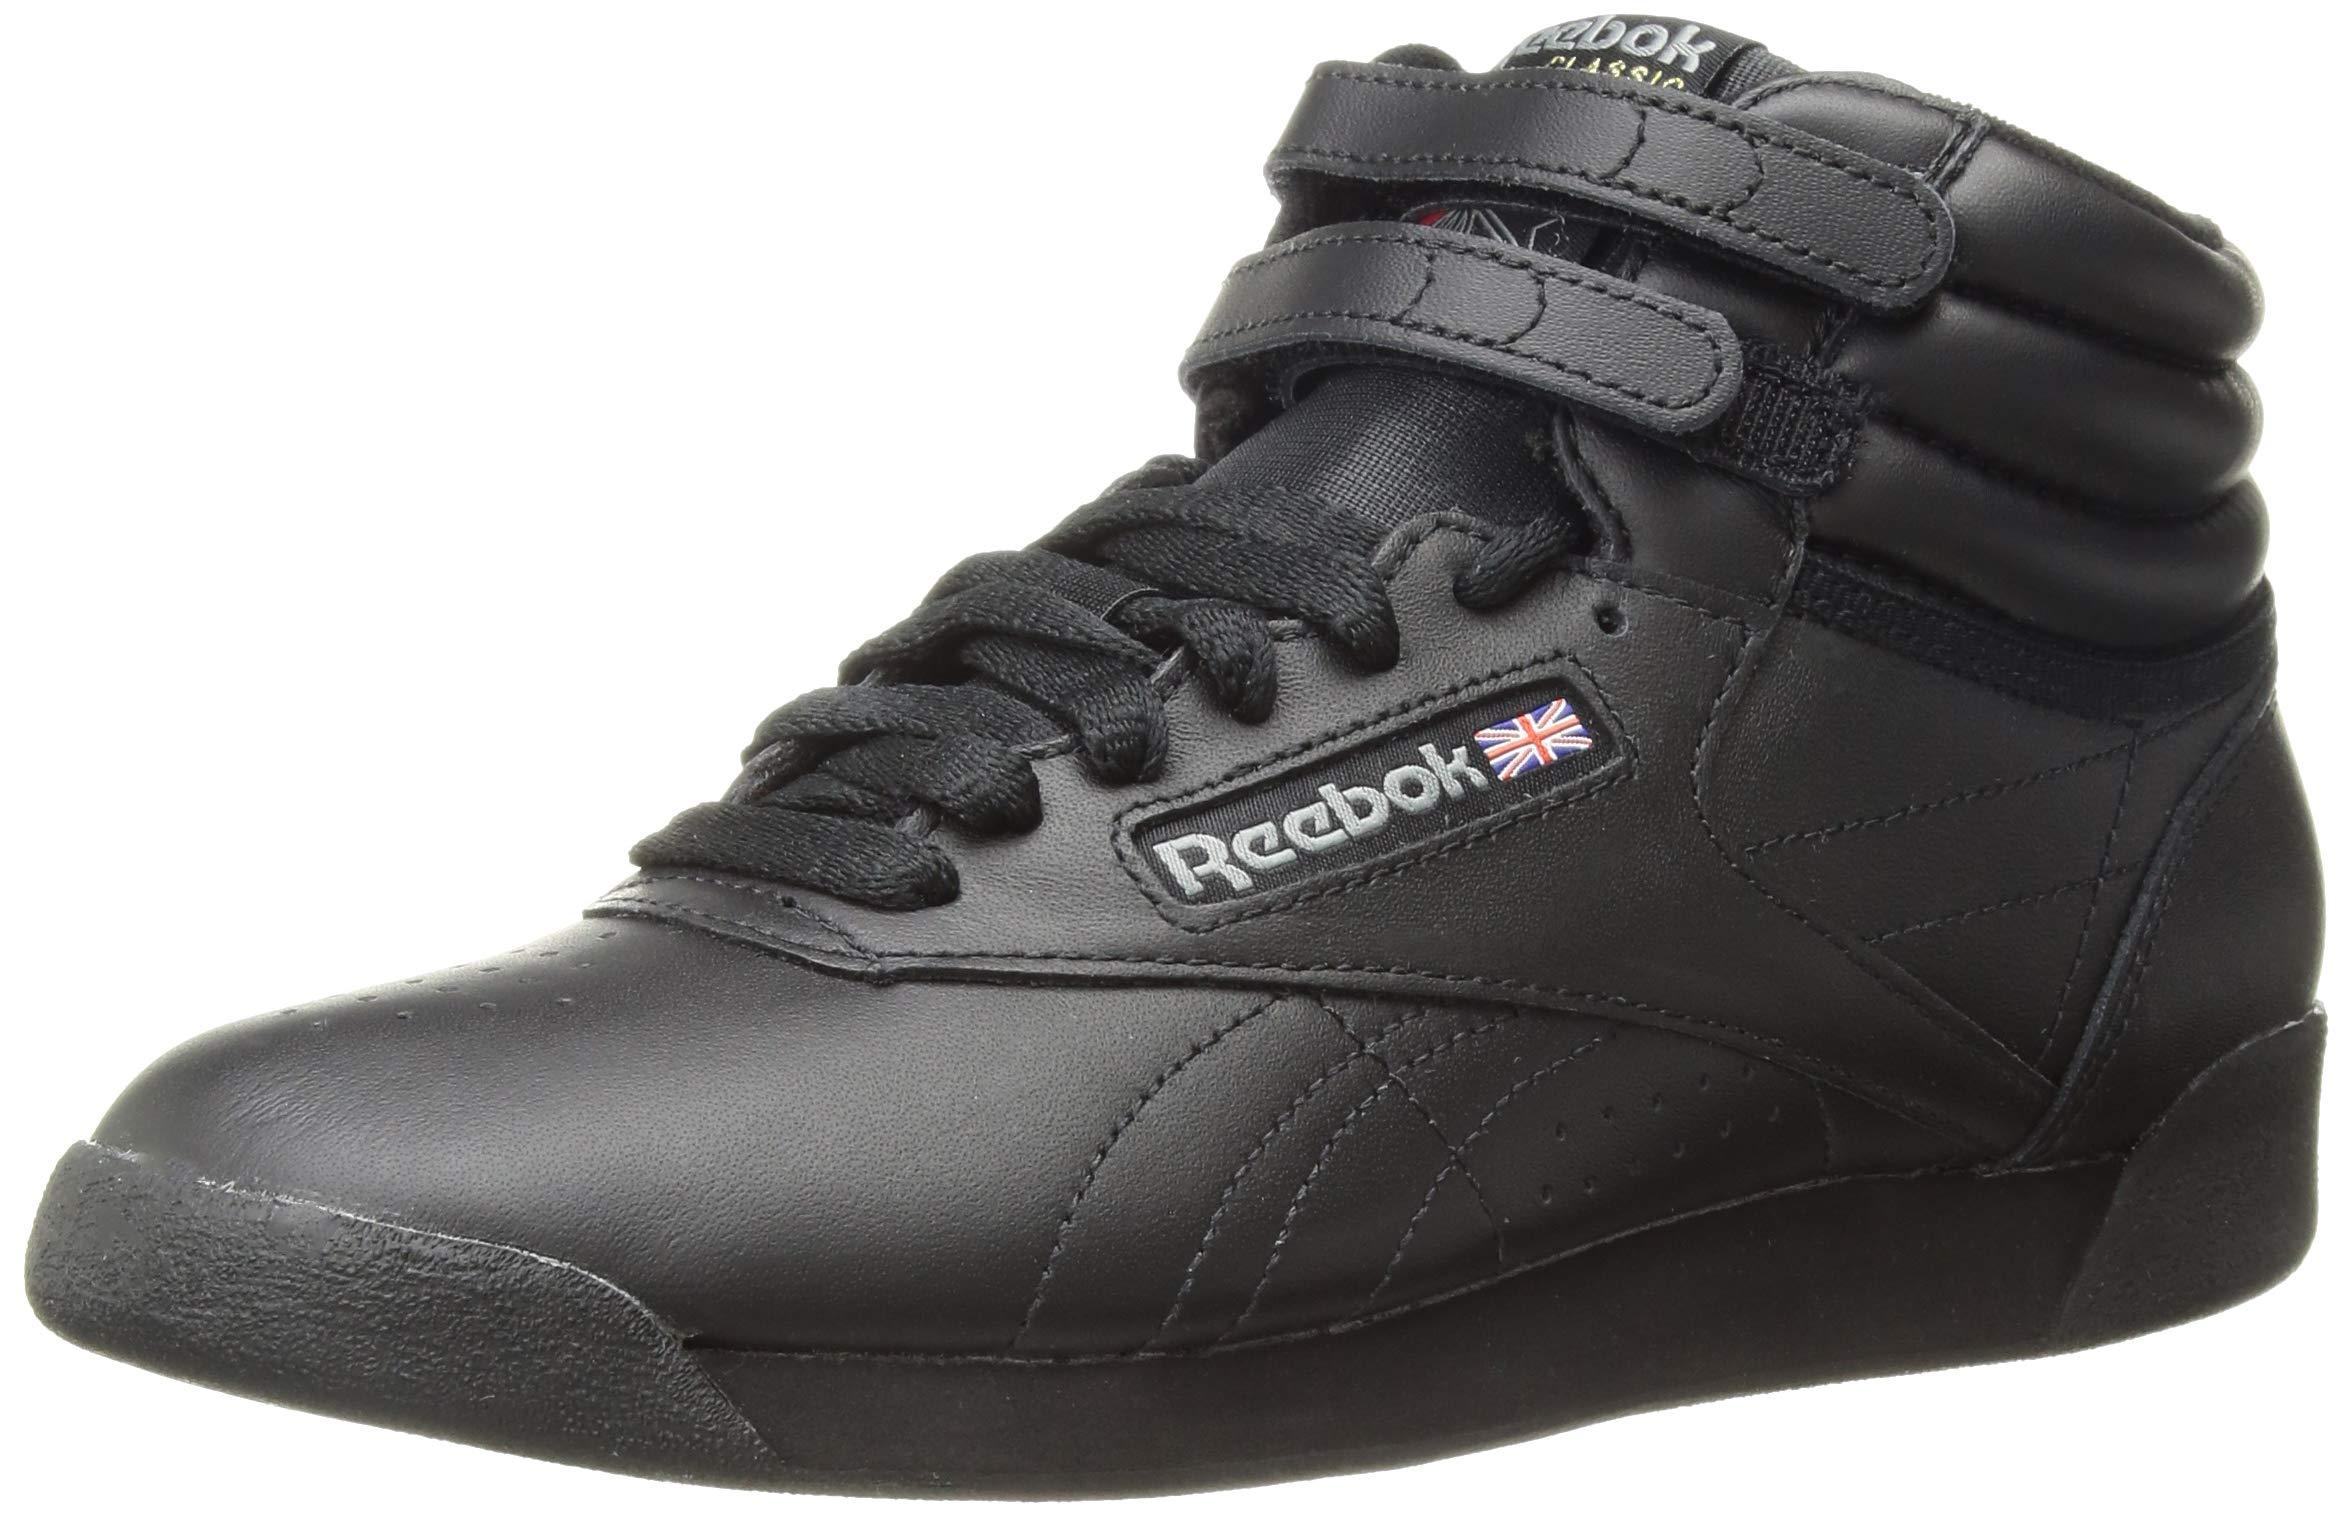 Reebok Women's Freestyle Hi Walking Shoe, Black, 7 M US